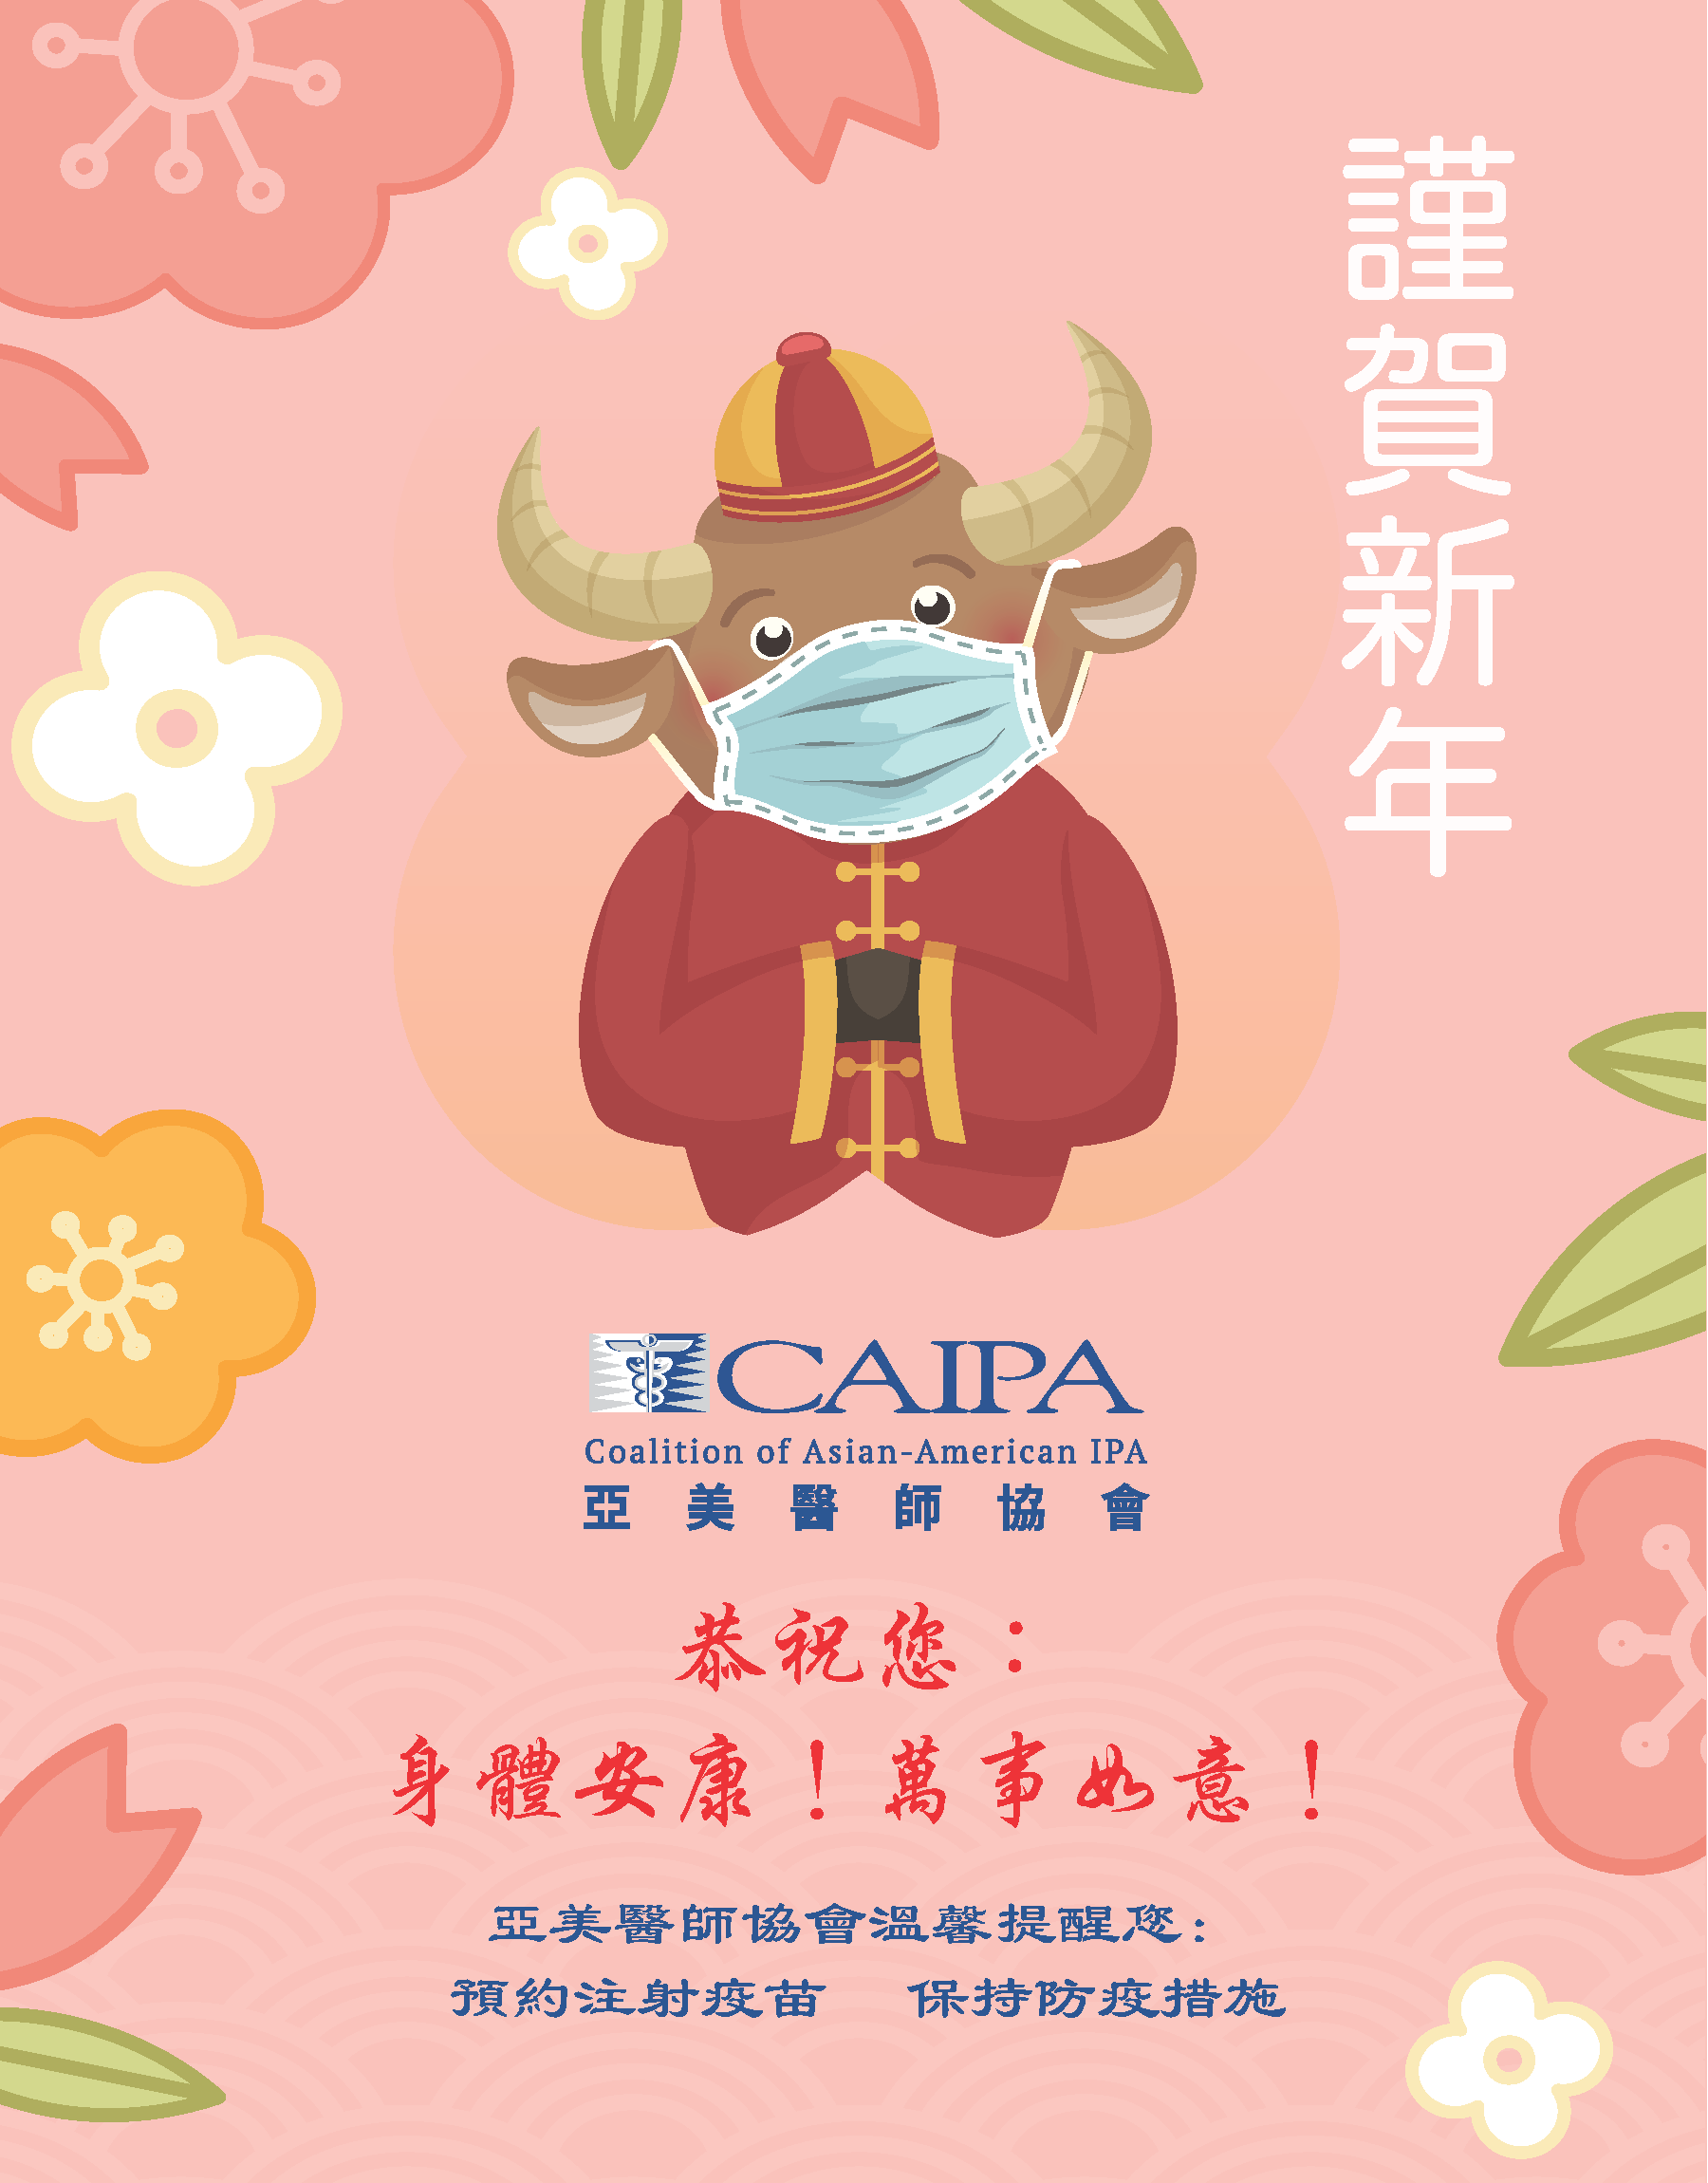 CAIPA Wishing You A Happy Lunar New Year 2021